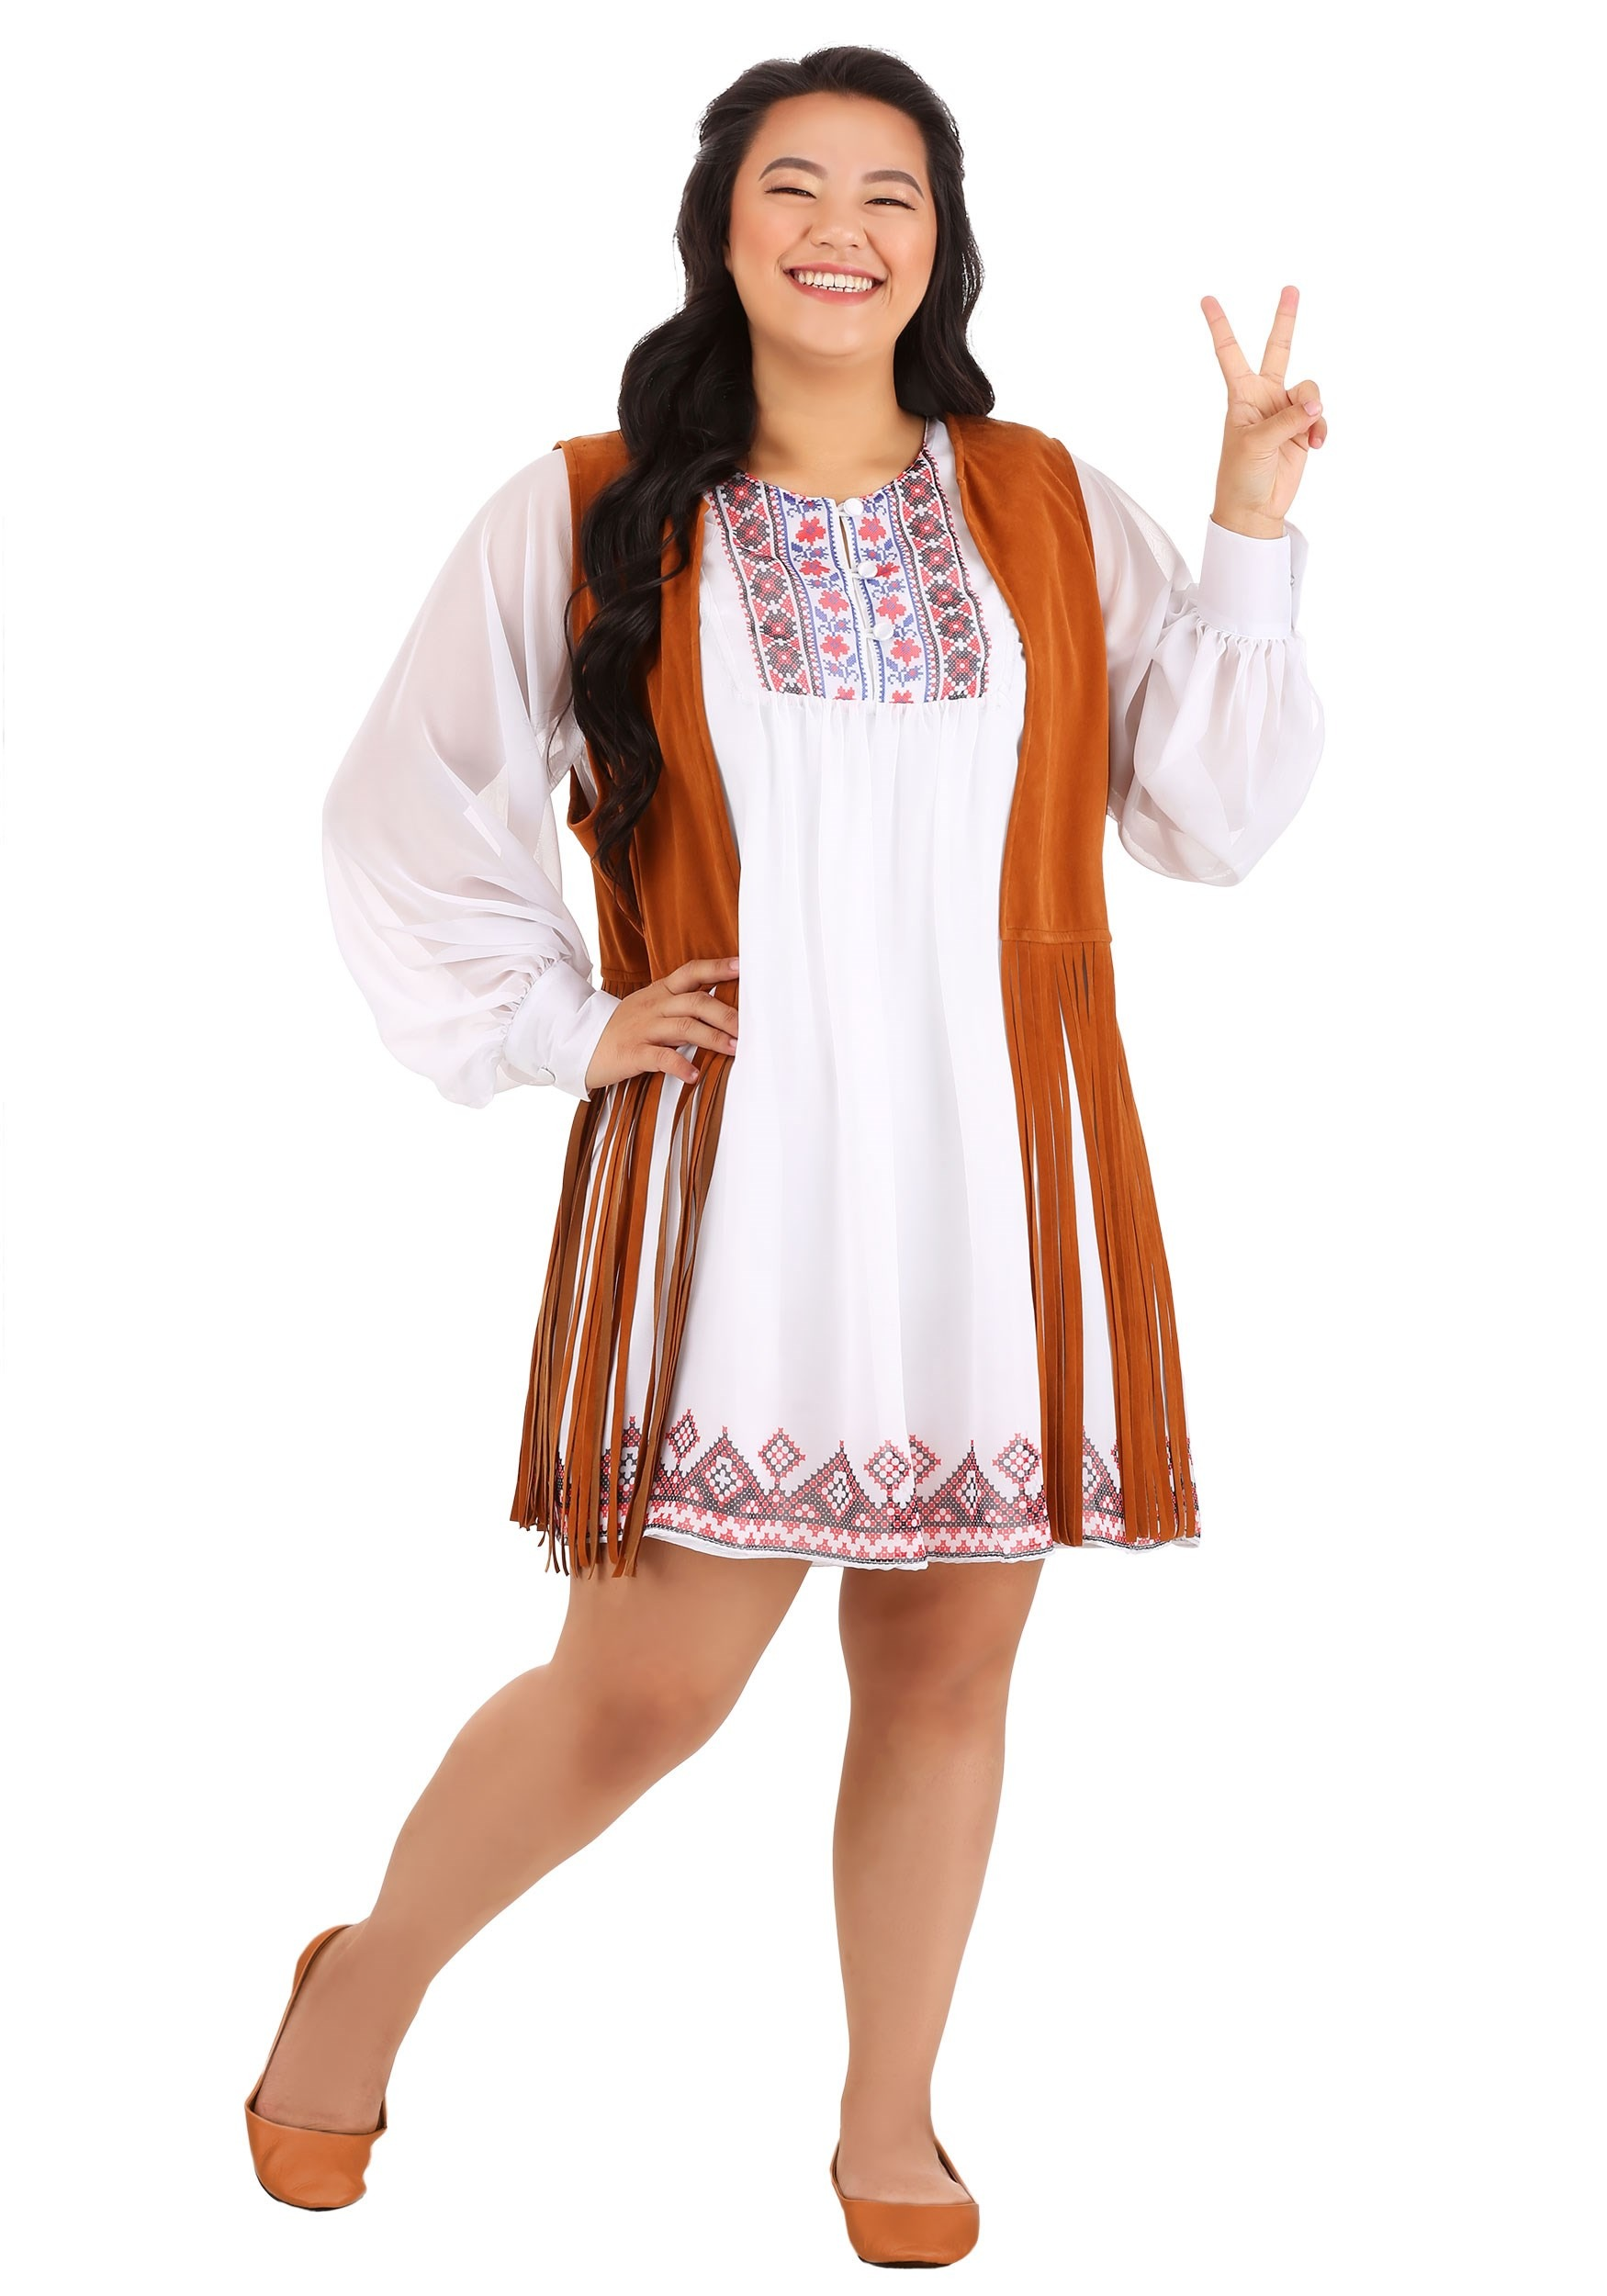 Plus Size 70s Free Spirit Costume for Women